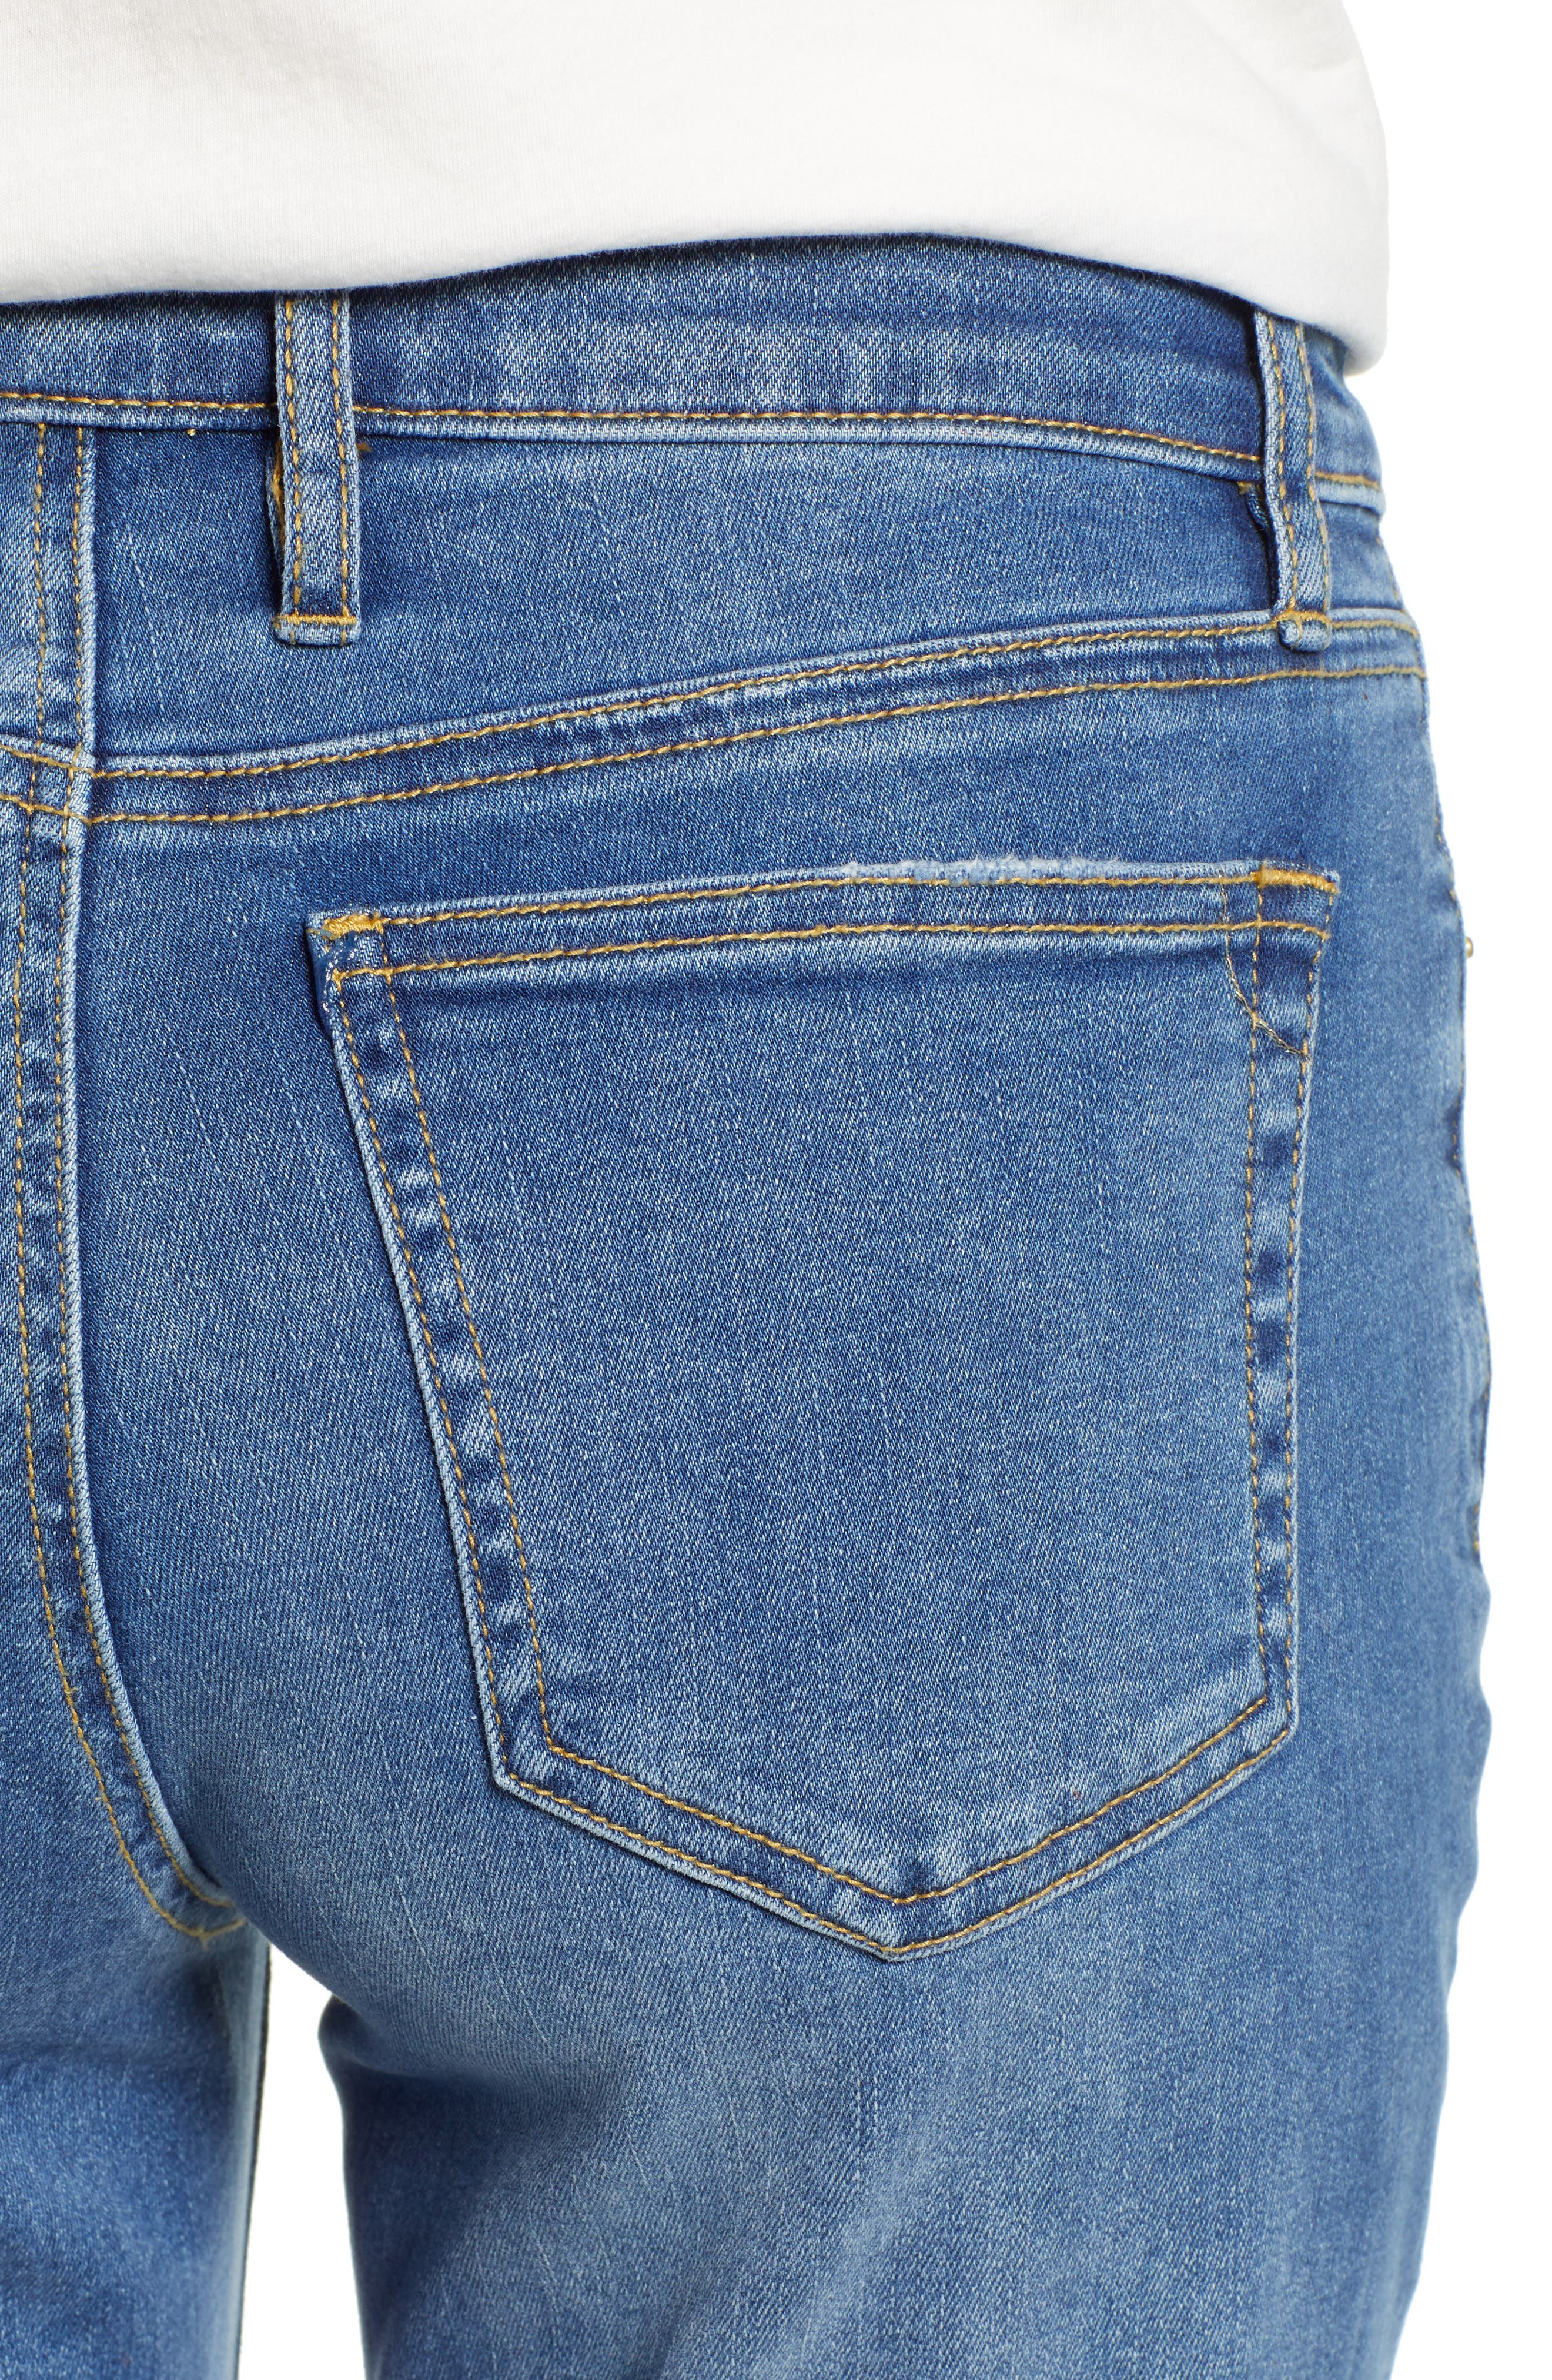 Tema Slim Boyfriend Jeans,                             Alternate thumbnail 13, color,